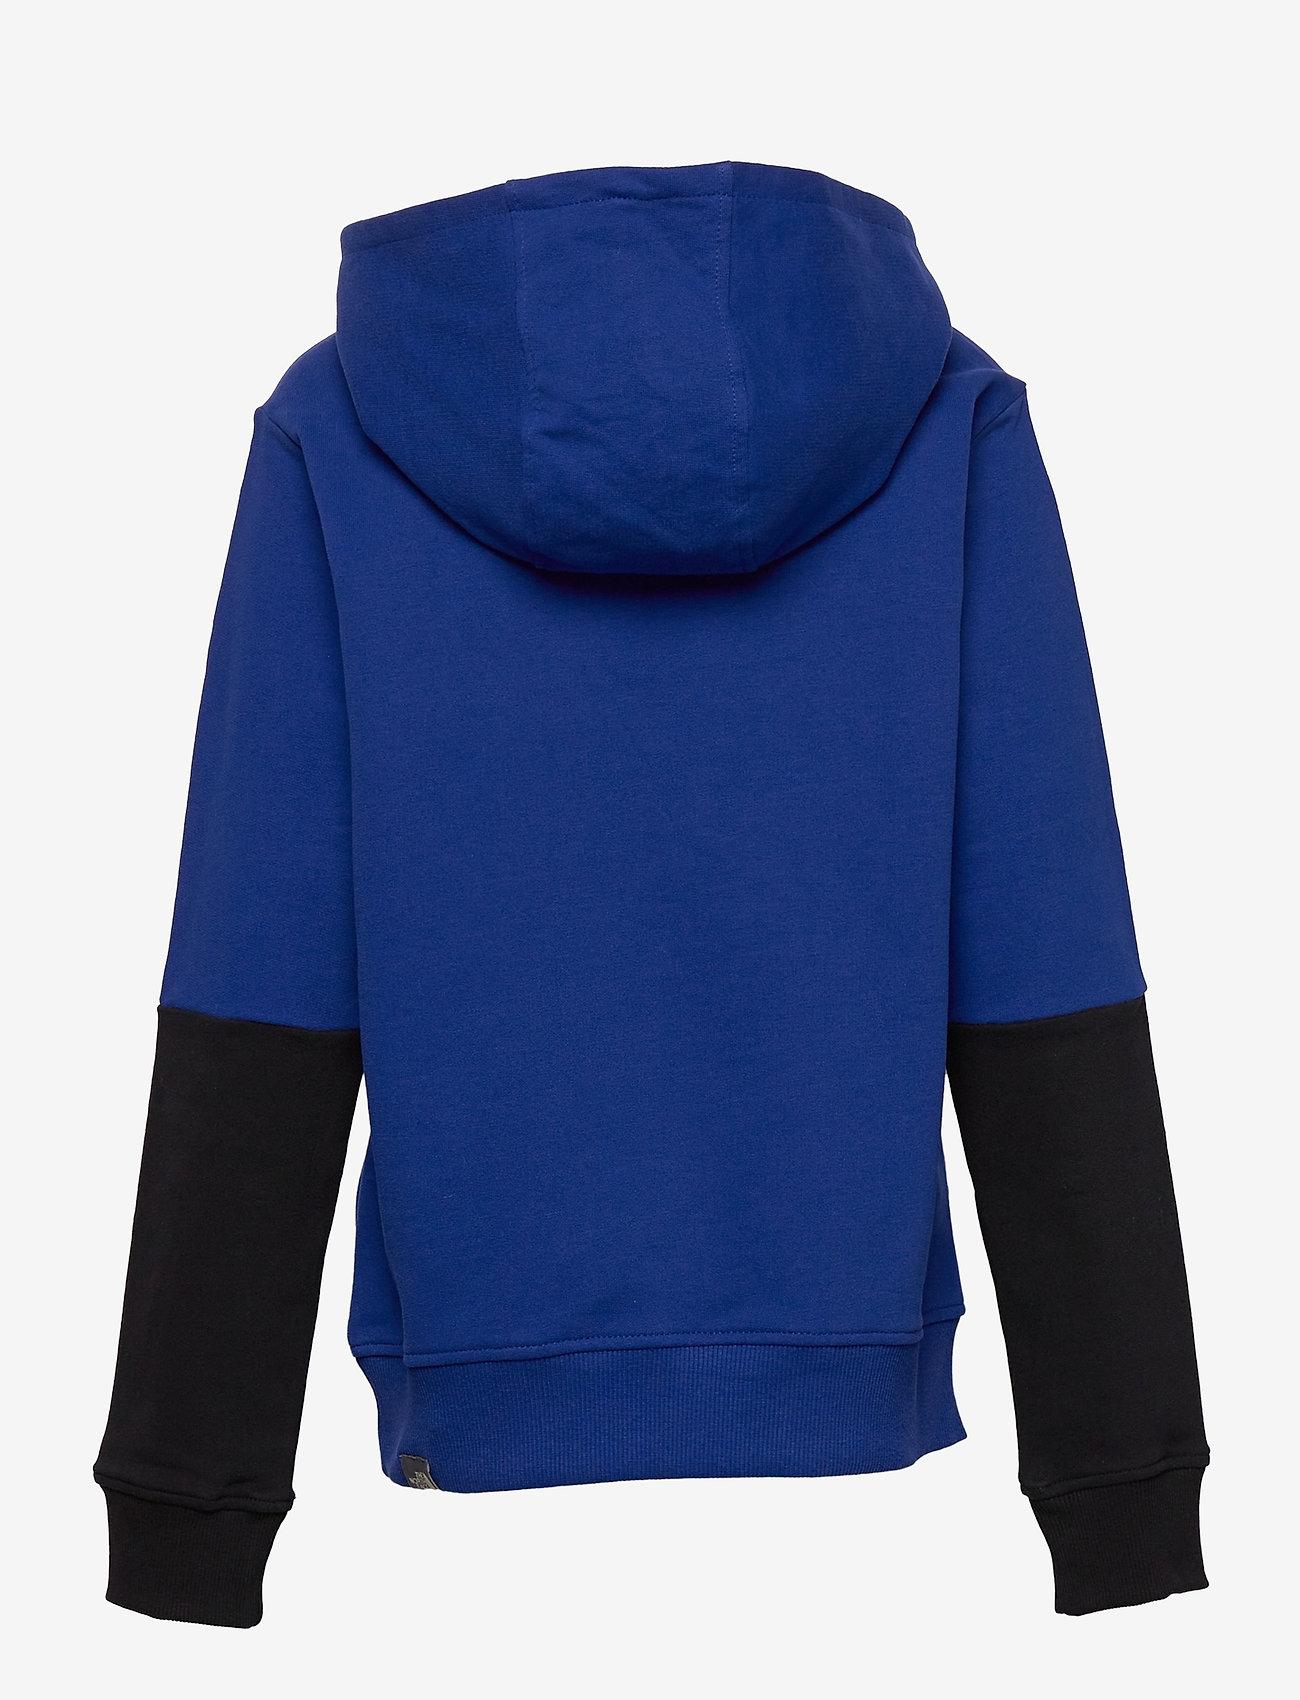 The North Face - Y DREW PEAK LIGHT P/O HOODIE - hoodies - bolt blue - 1